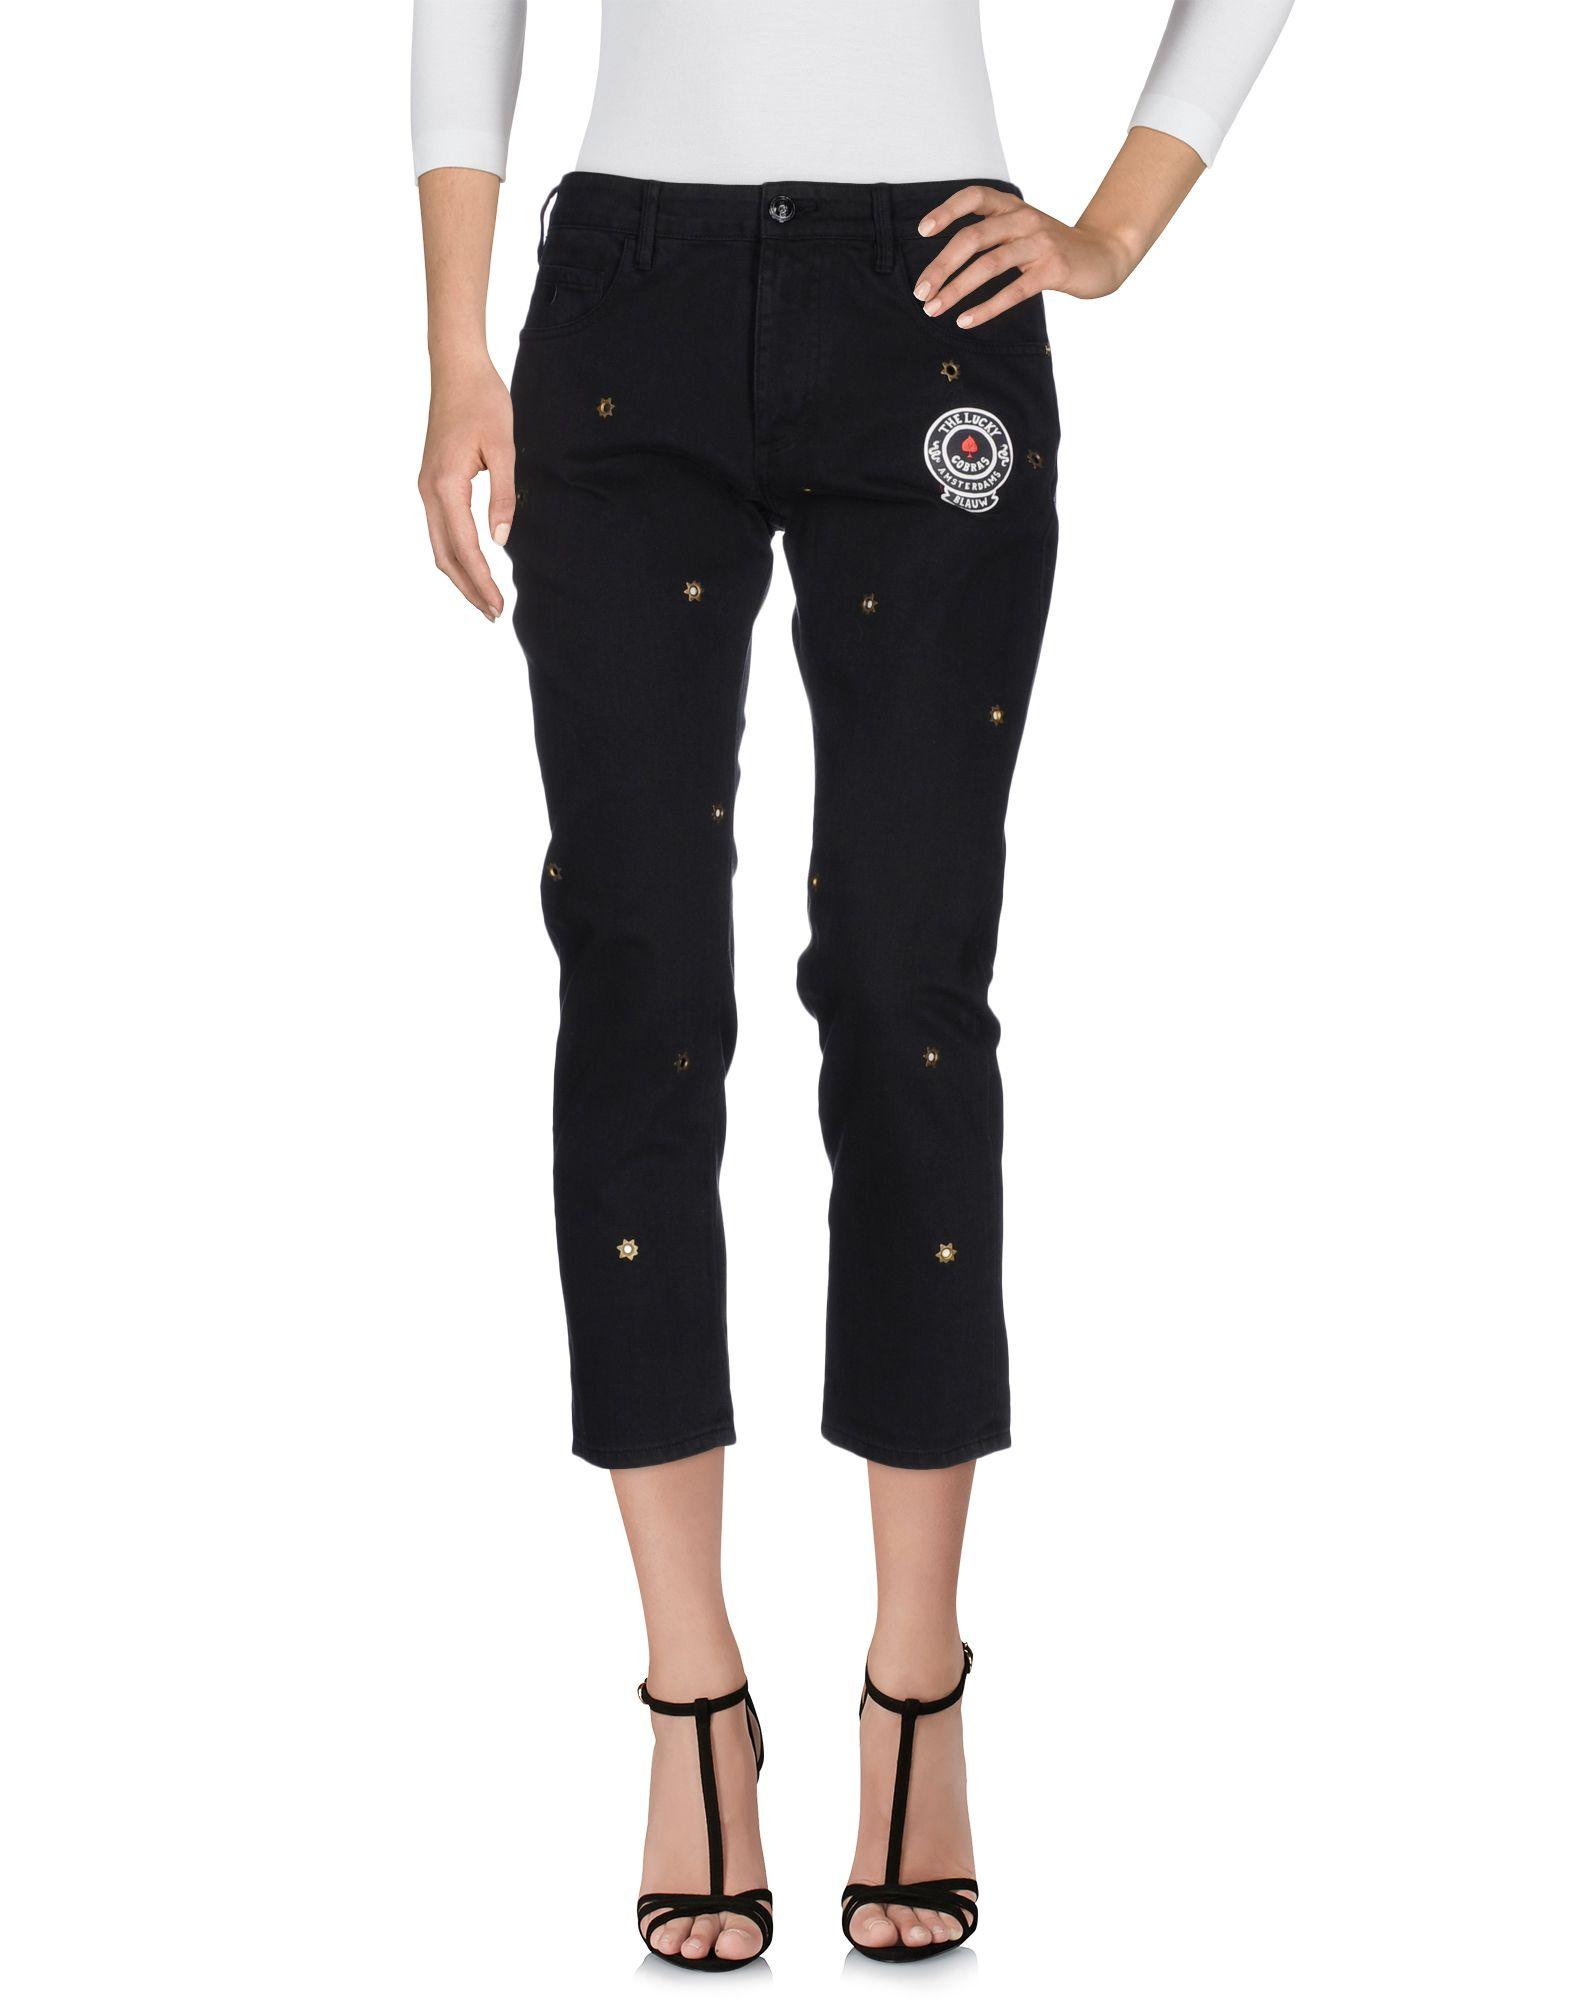 SCOTCH & SODA Damen Jeanshose Farbe Schwarz Größe 5 - broschei